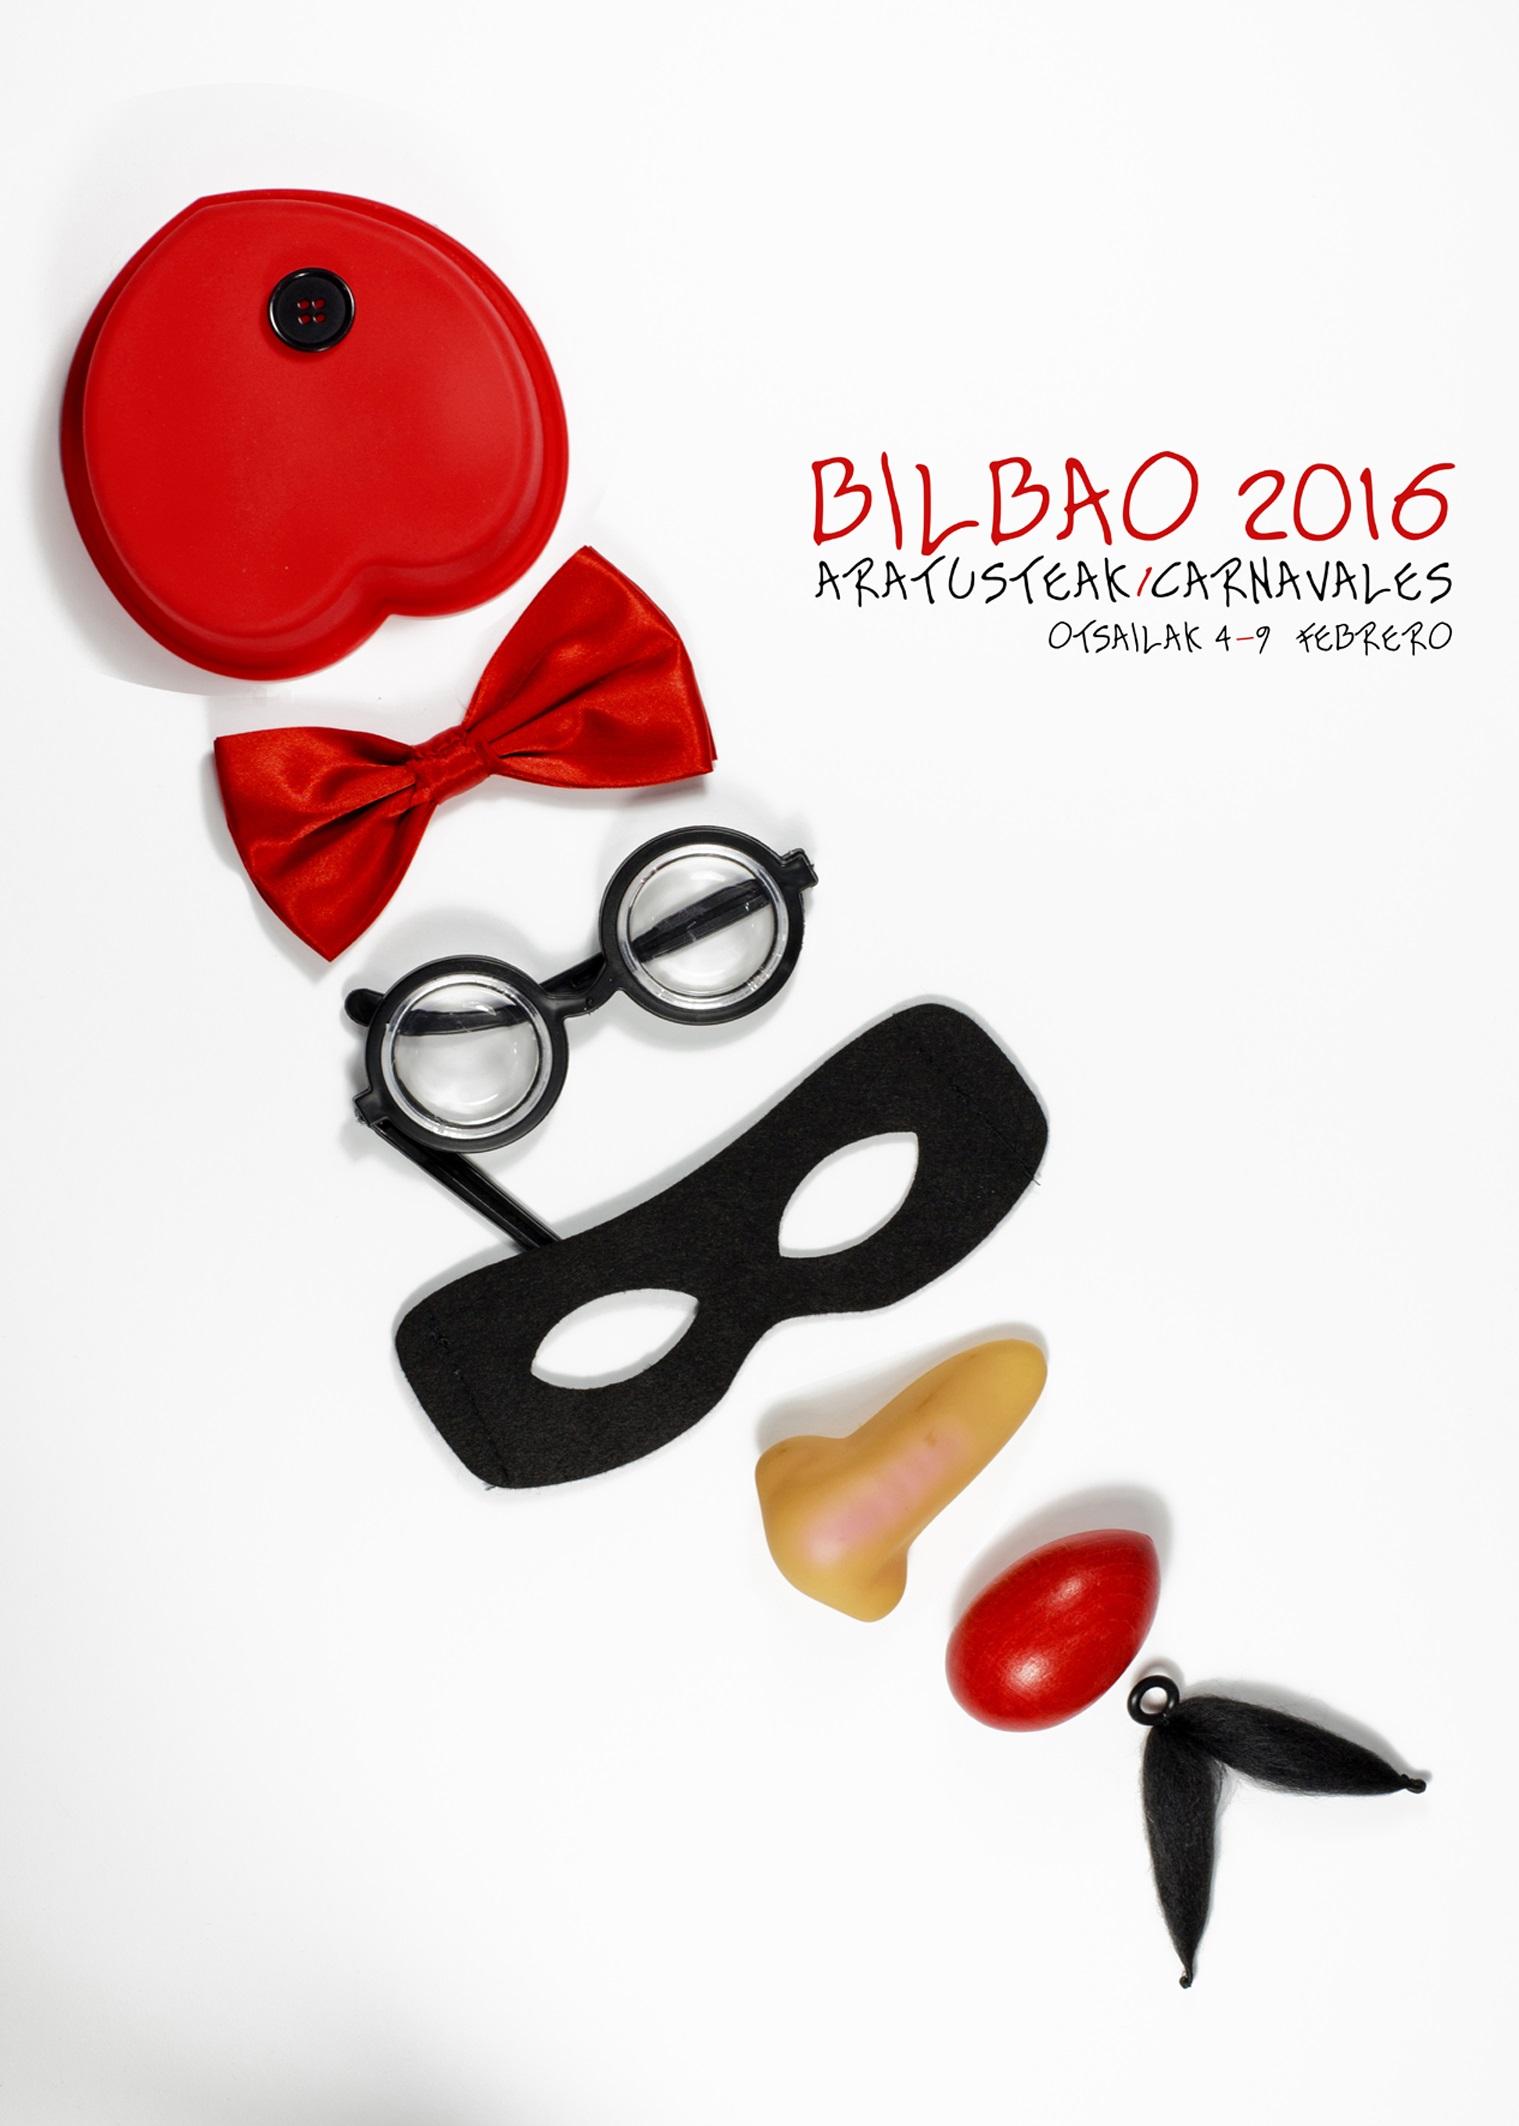 Cartel 1: Bilbao se disfraza